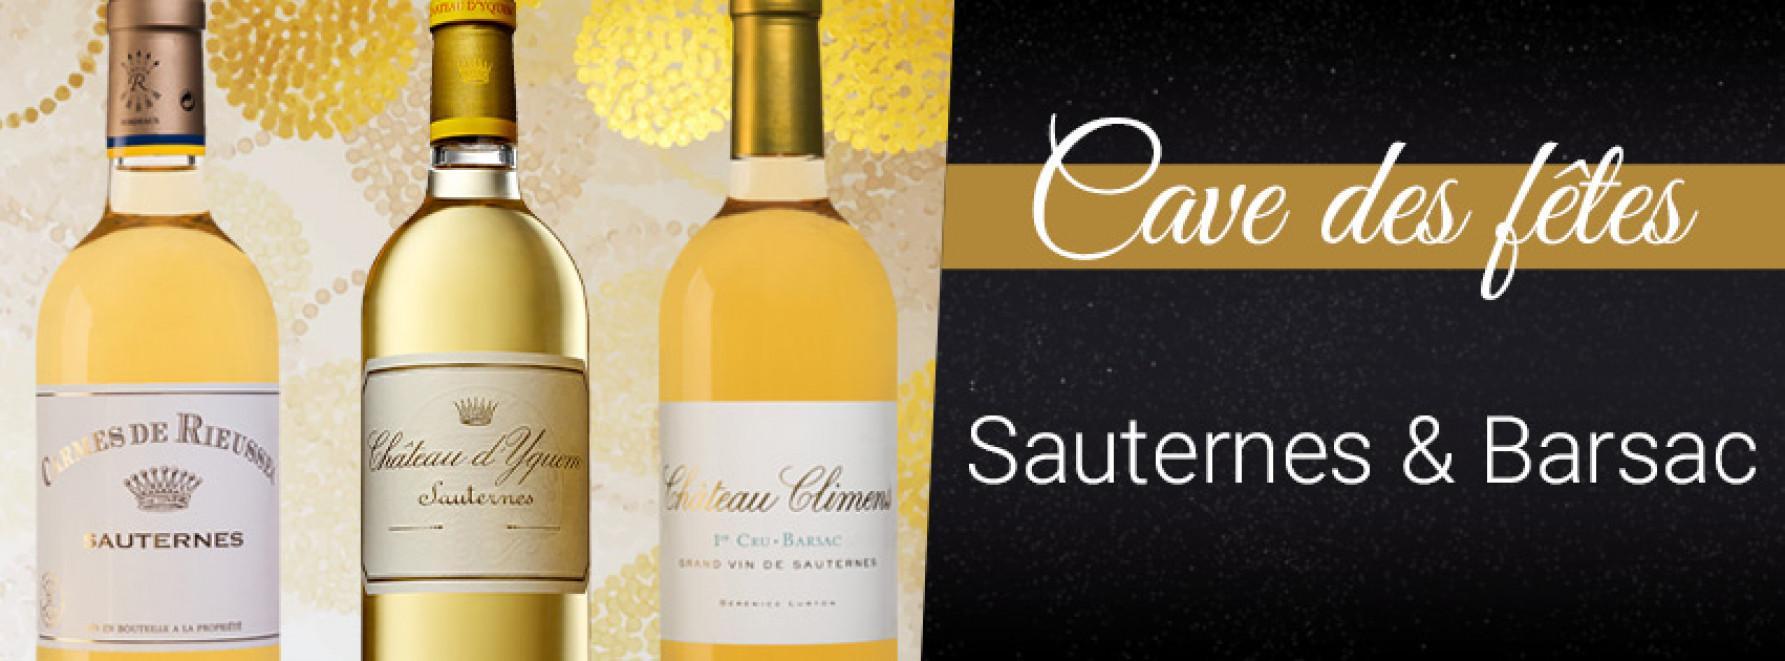 Cave des Fêtes : Sauternes & Barsac